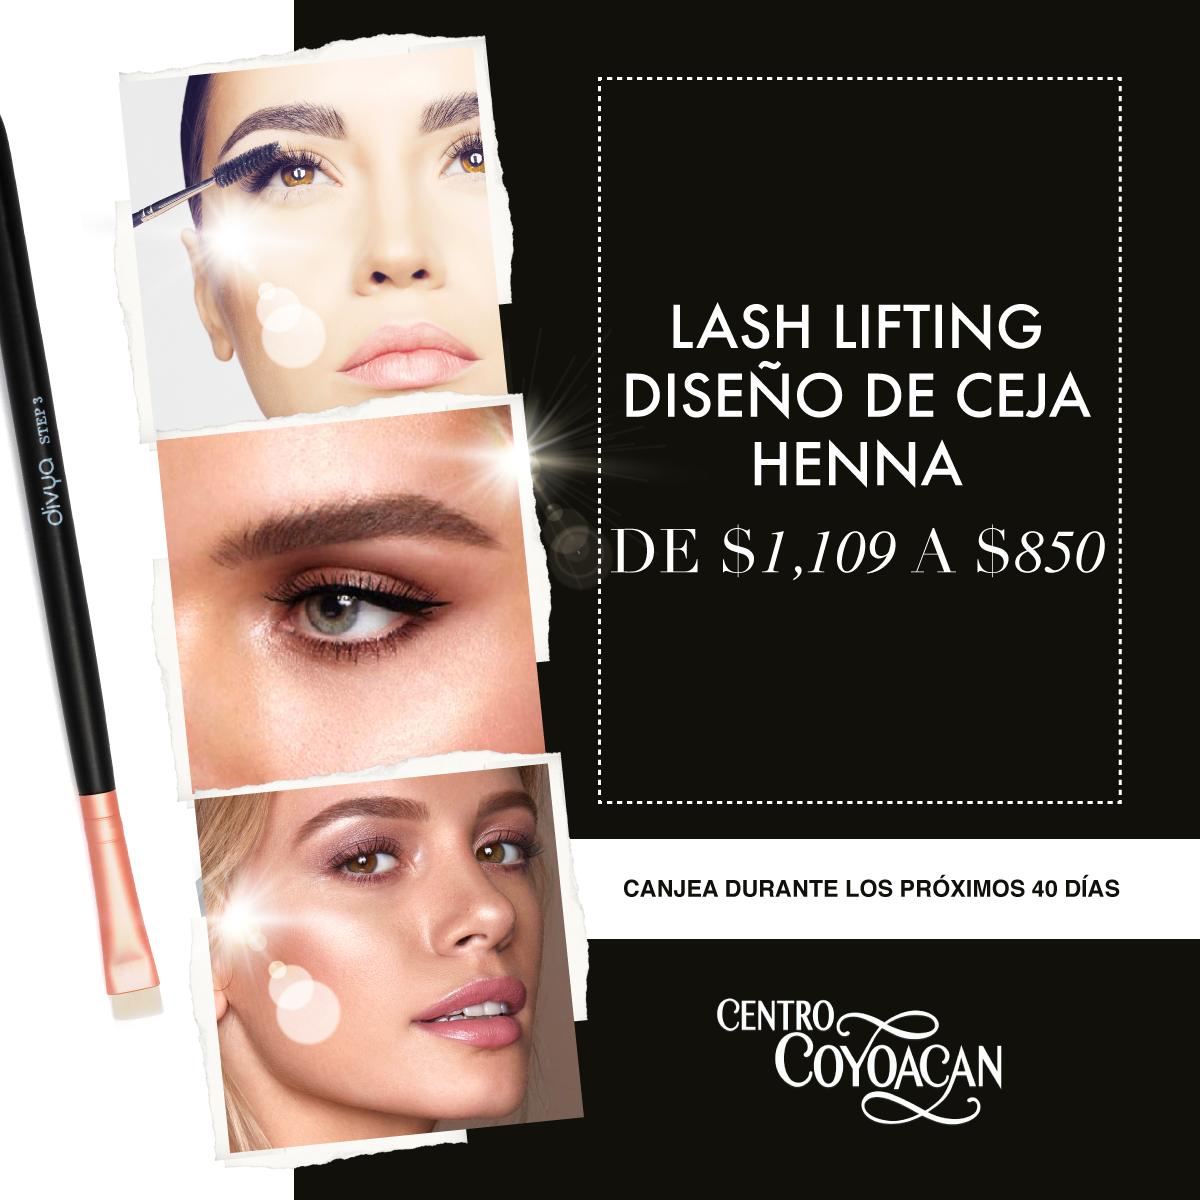 Lash Lifting + Diseño de Ceja + Henna *Promo Centro Coyoacán&w=900&h=900&fit=crop